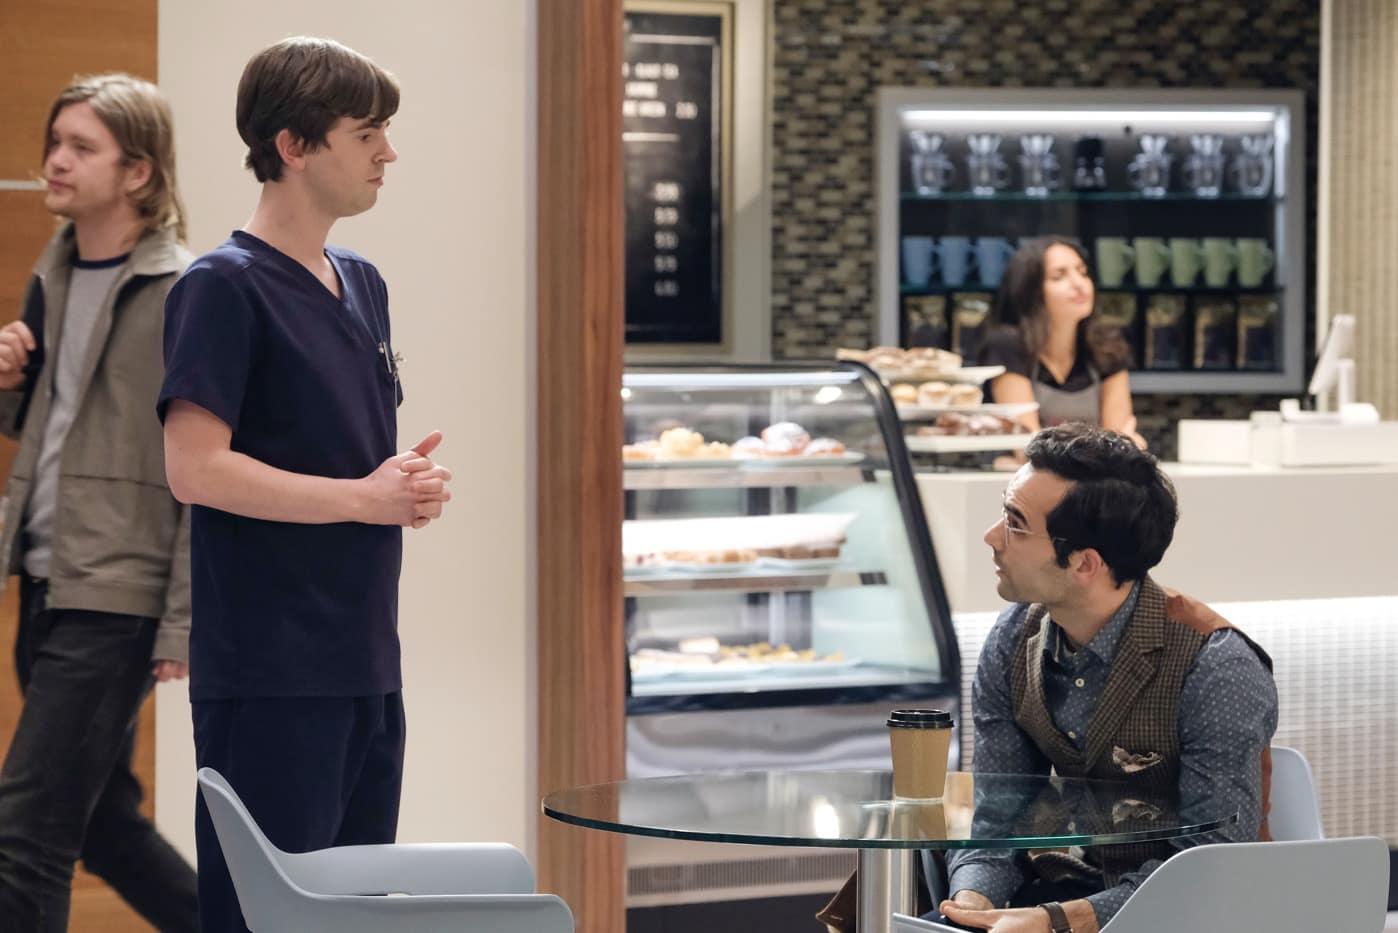 THE GOOD DOCTOR Season 4 Episode 9 FREDDIE HIGHMORE, JOHNATHAN SOUSA